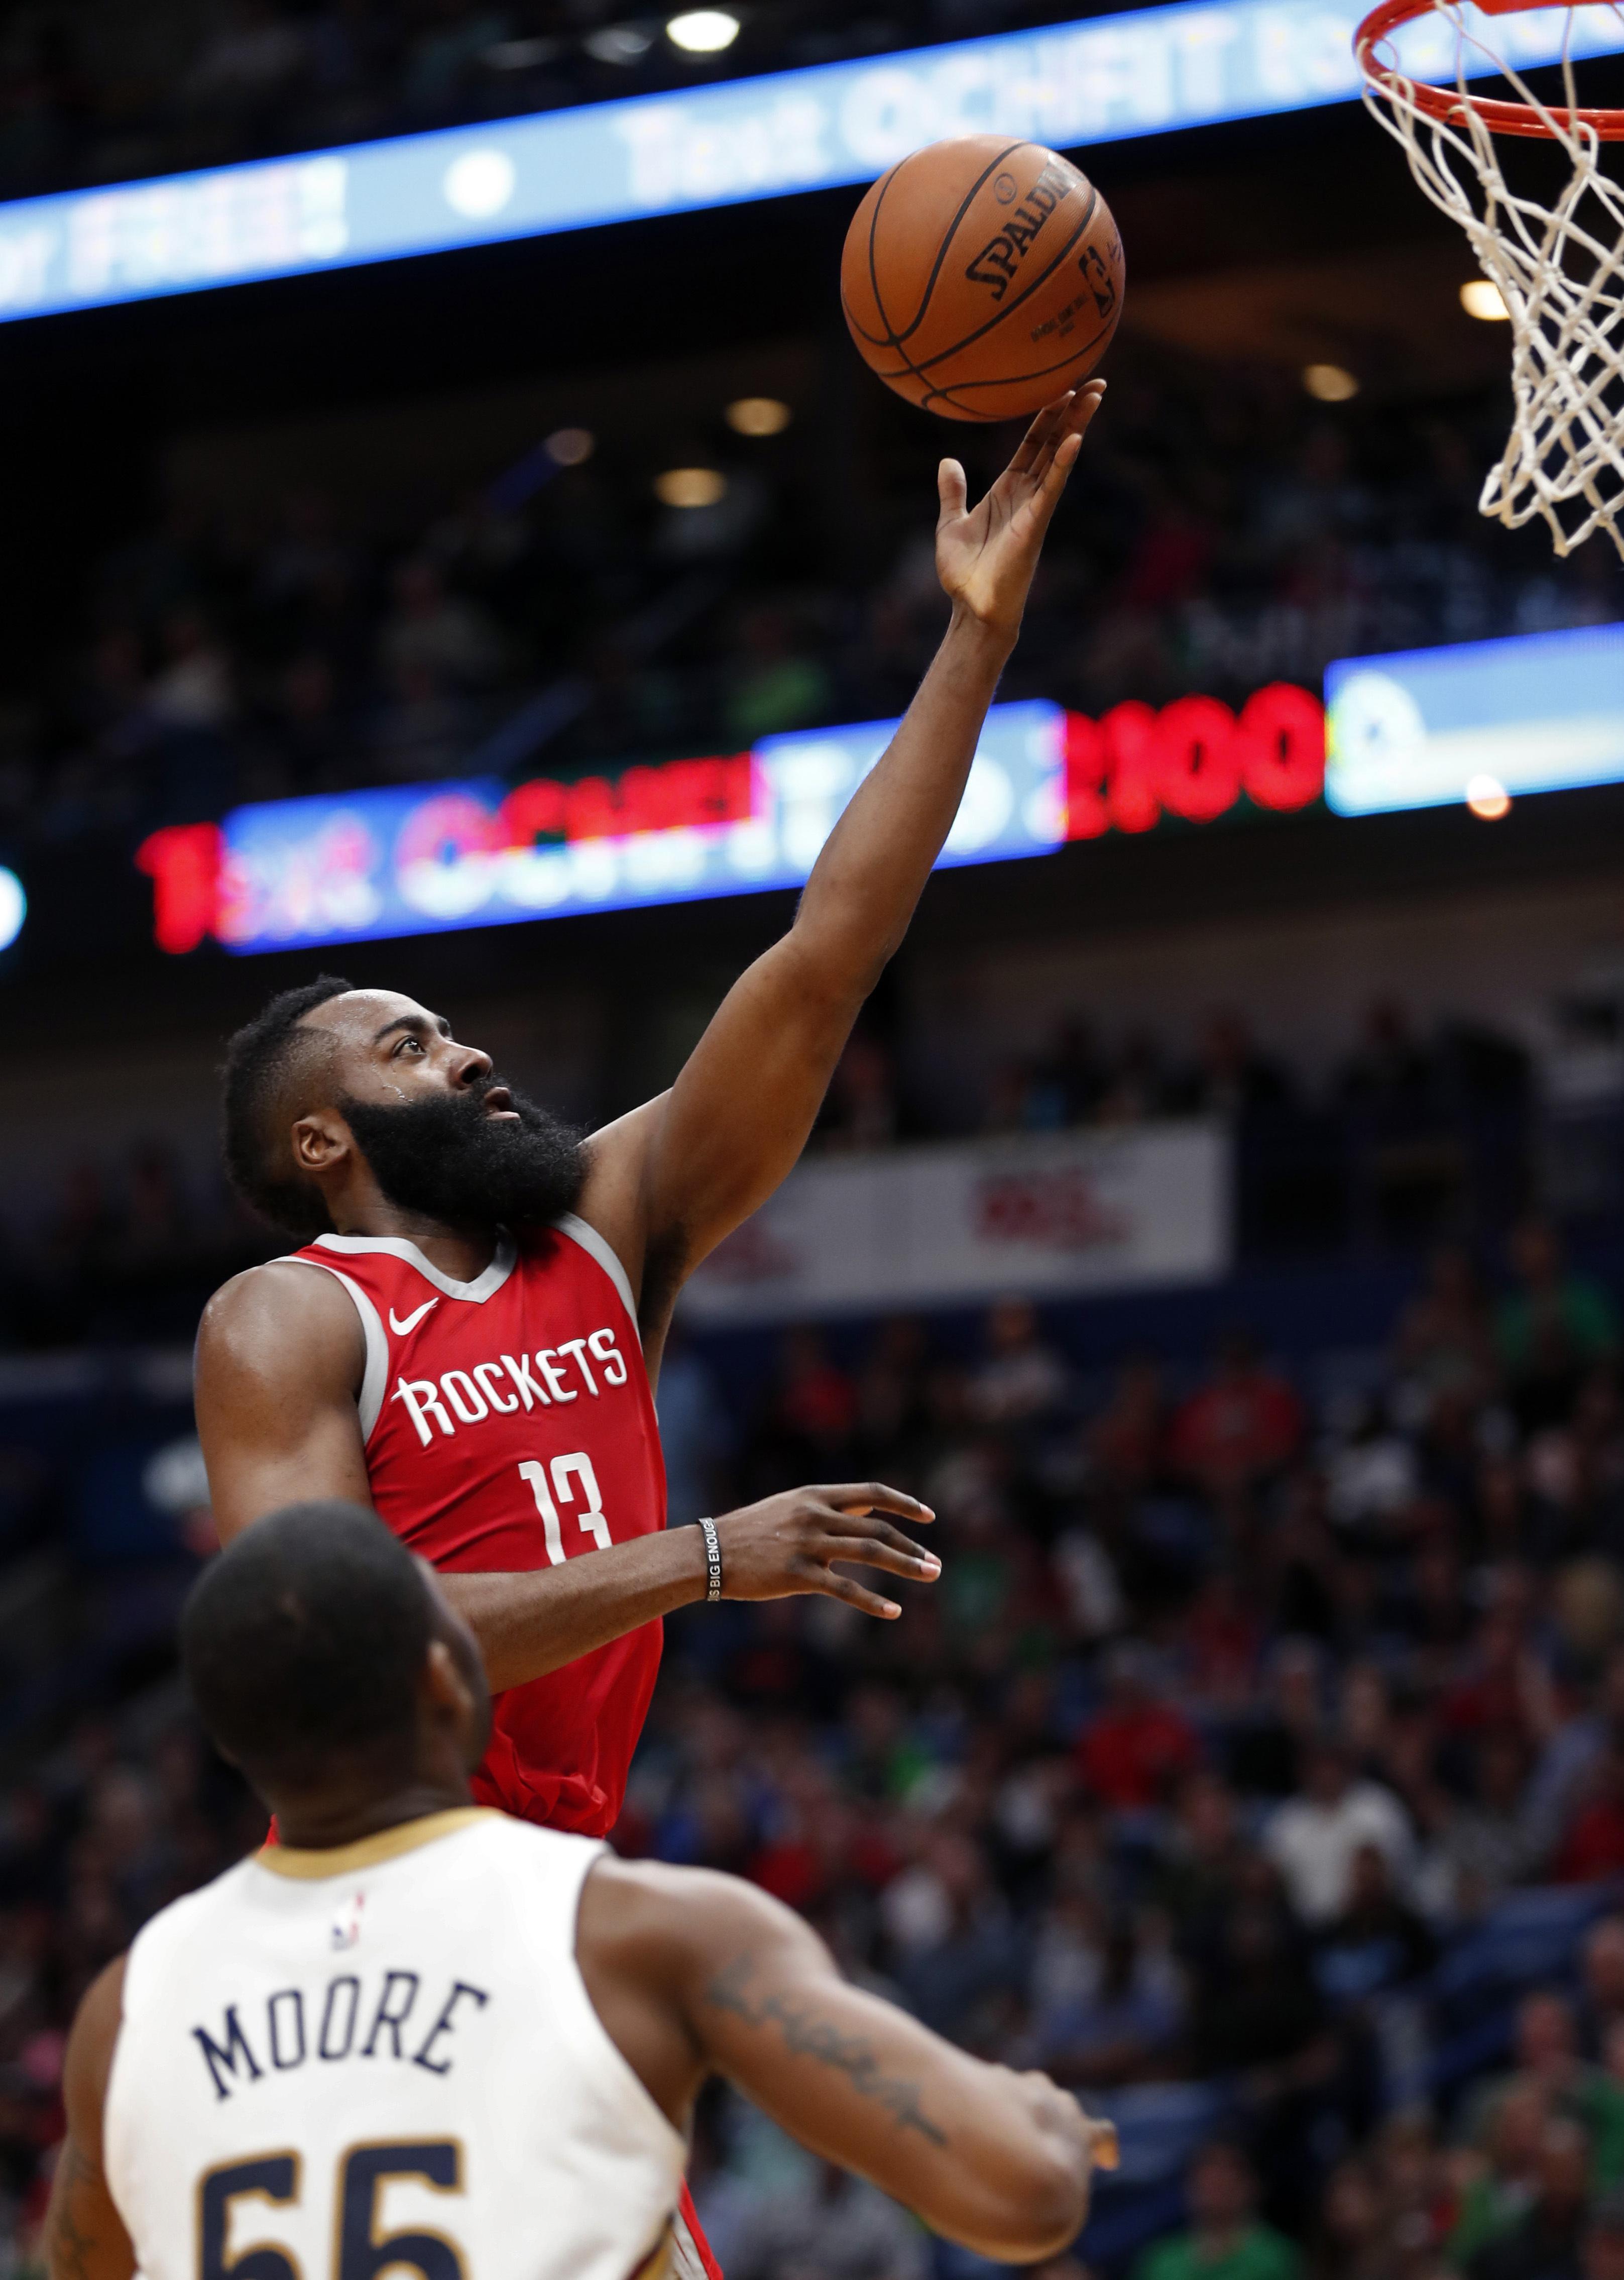 Rockets_pelicans_basketball_92986